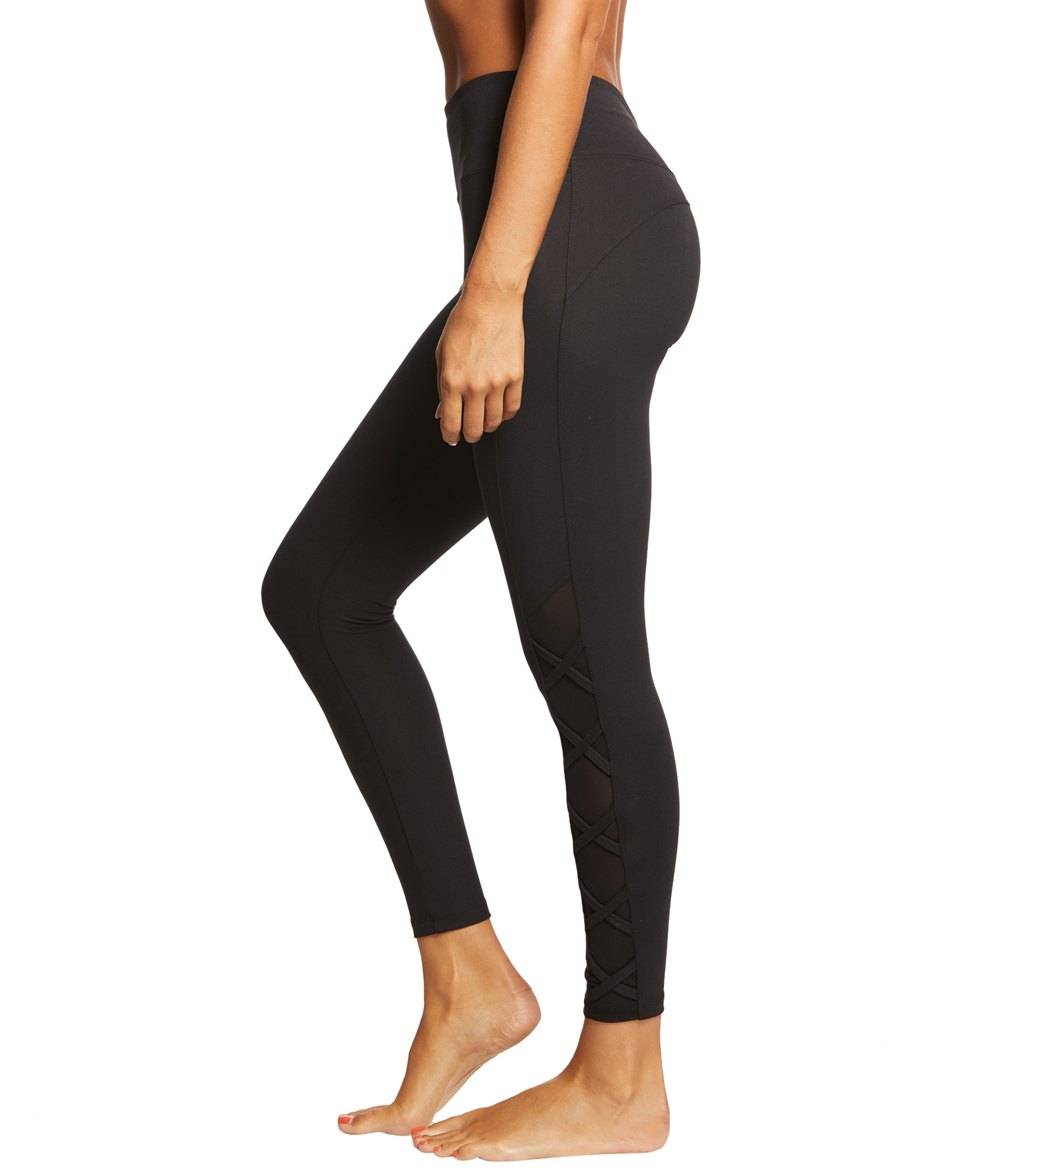 af63479ed9 Marika Celeste Tummy Control High Waisted Yoga Leggings at YogaOutlet.com -  Free Shipping